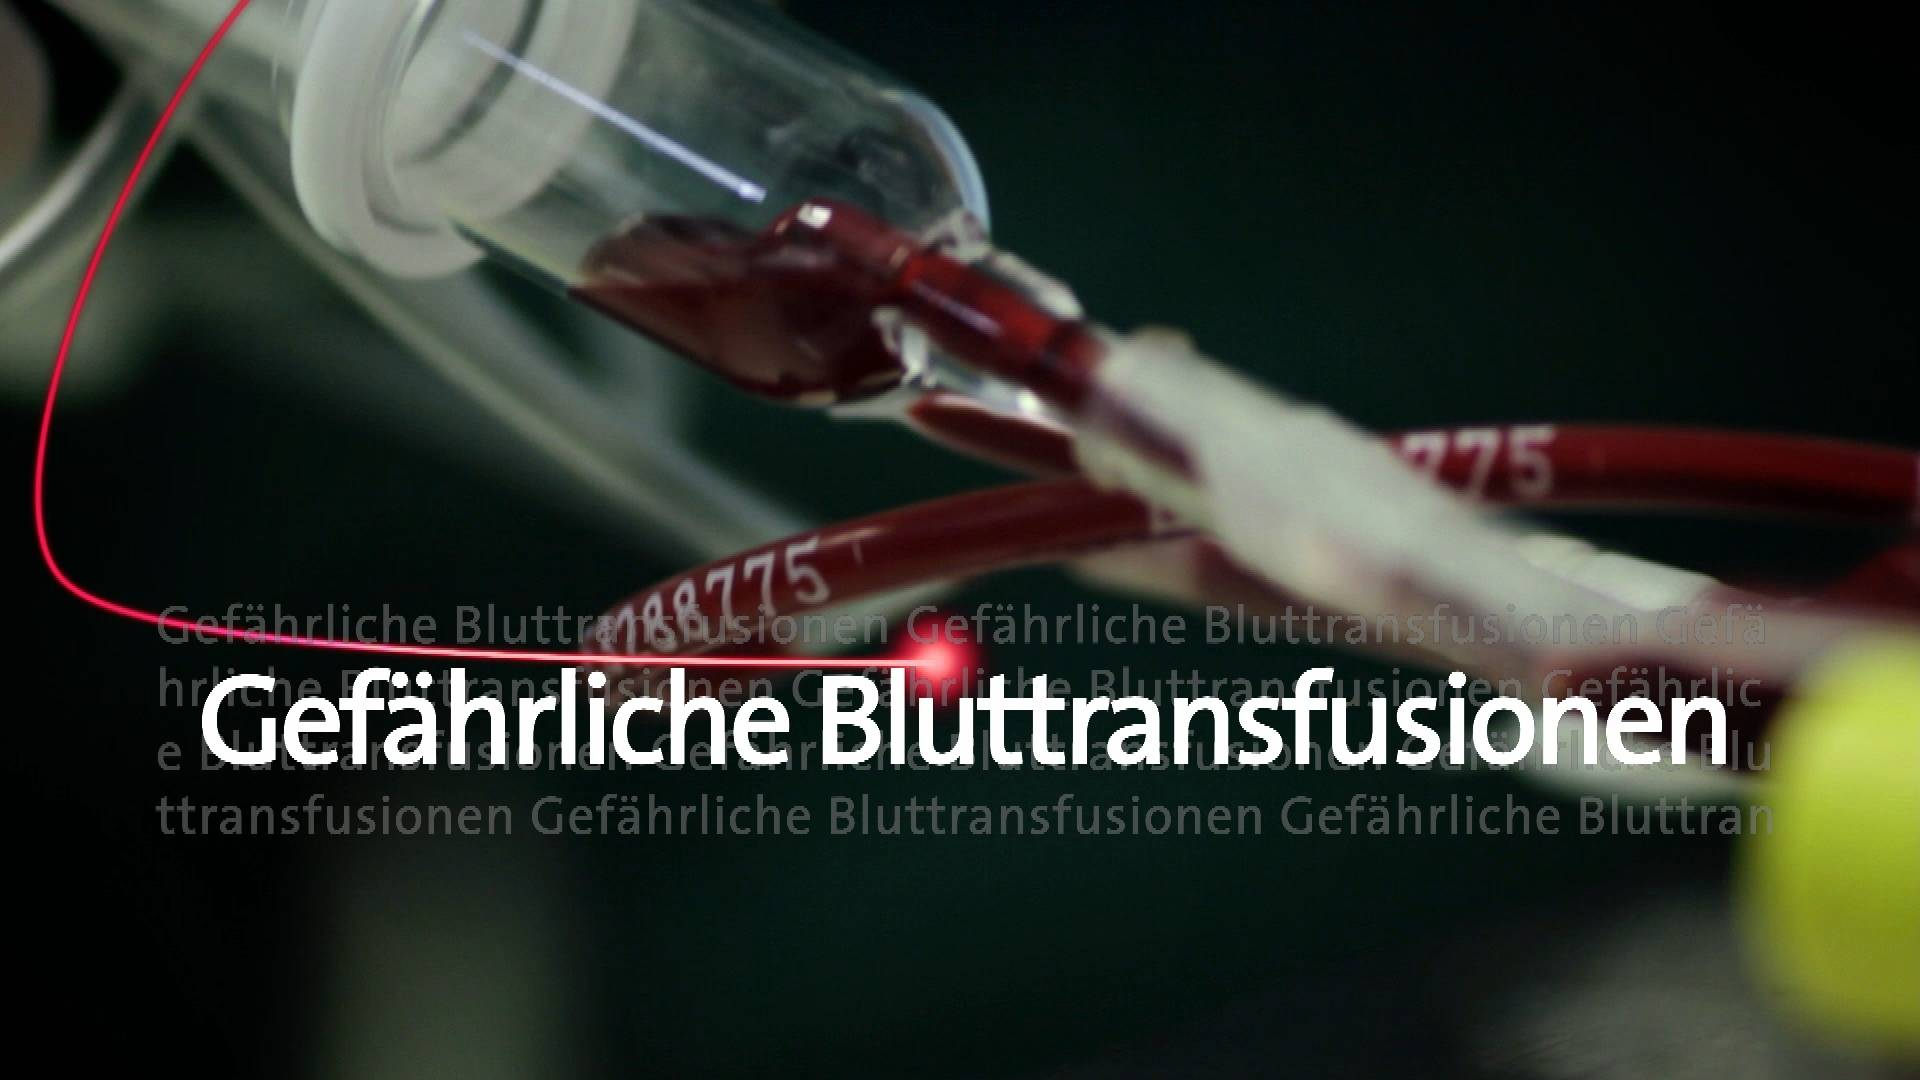 Gefährliche Bluttransfusionen - Dangerous Blood Transfusions